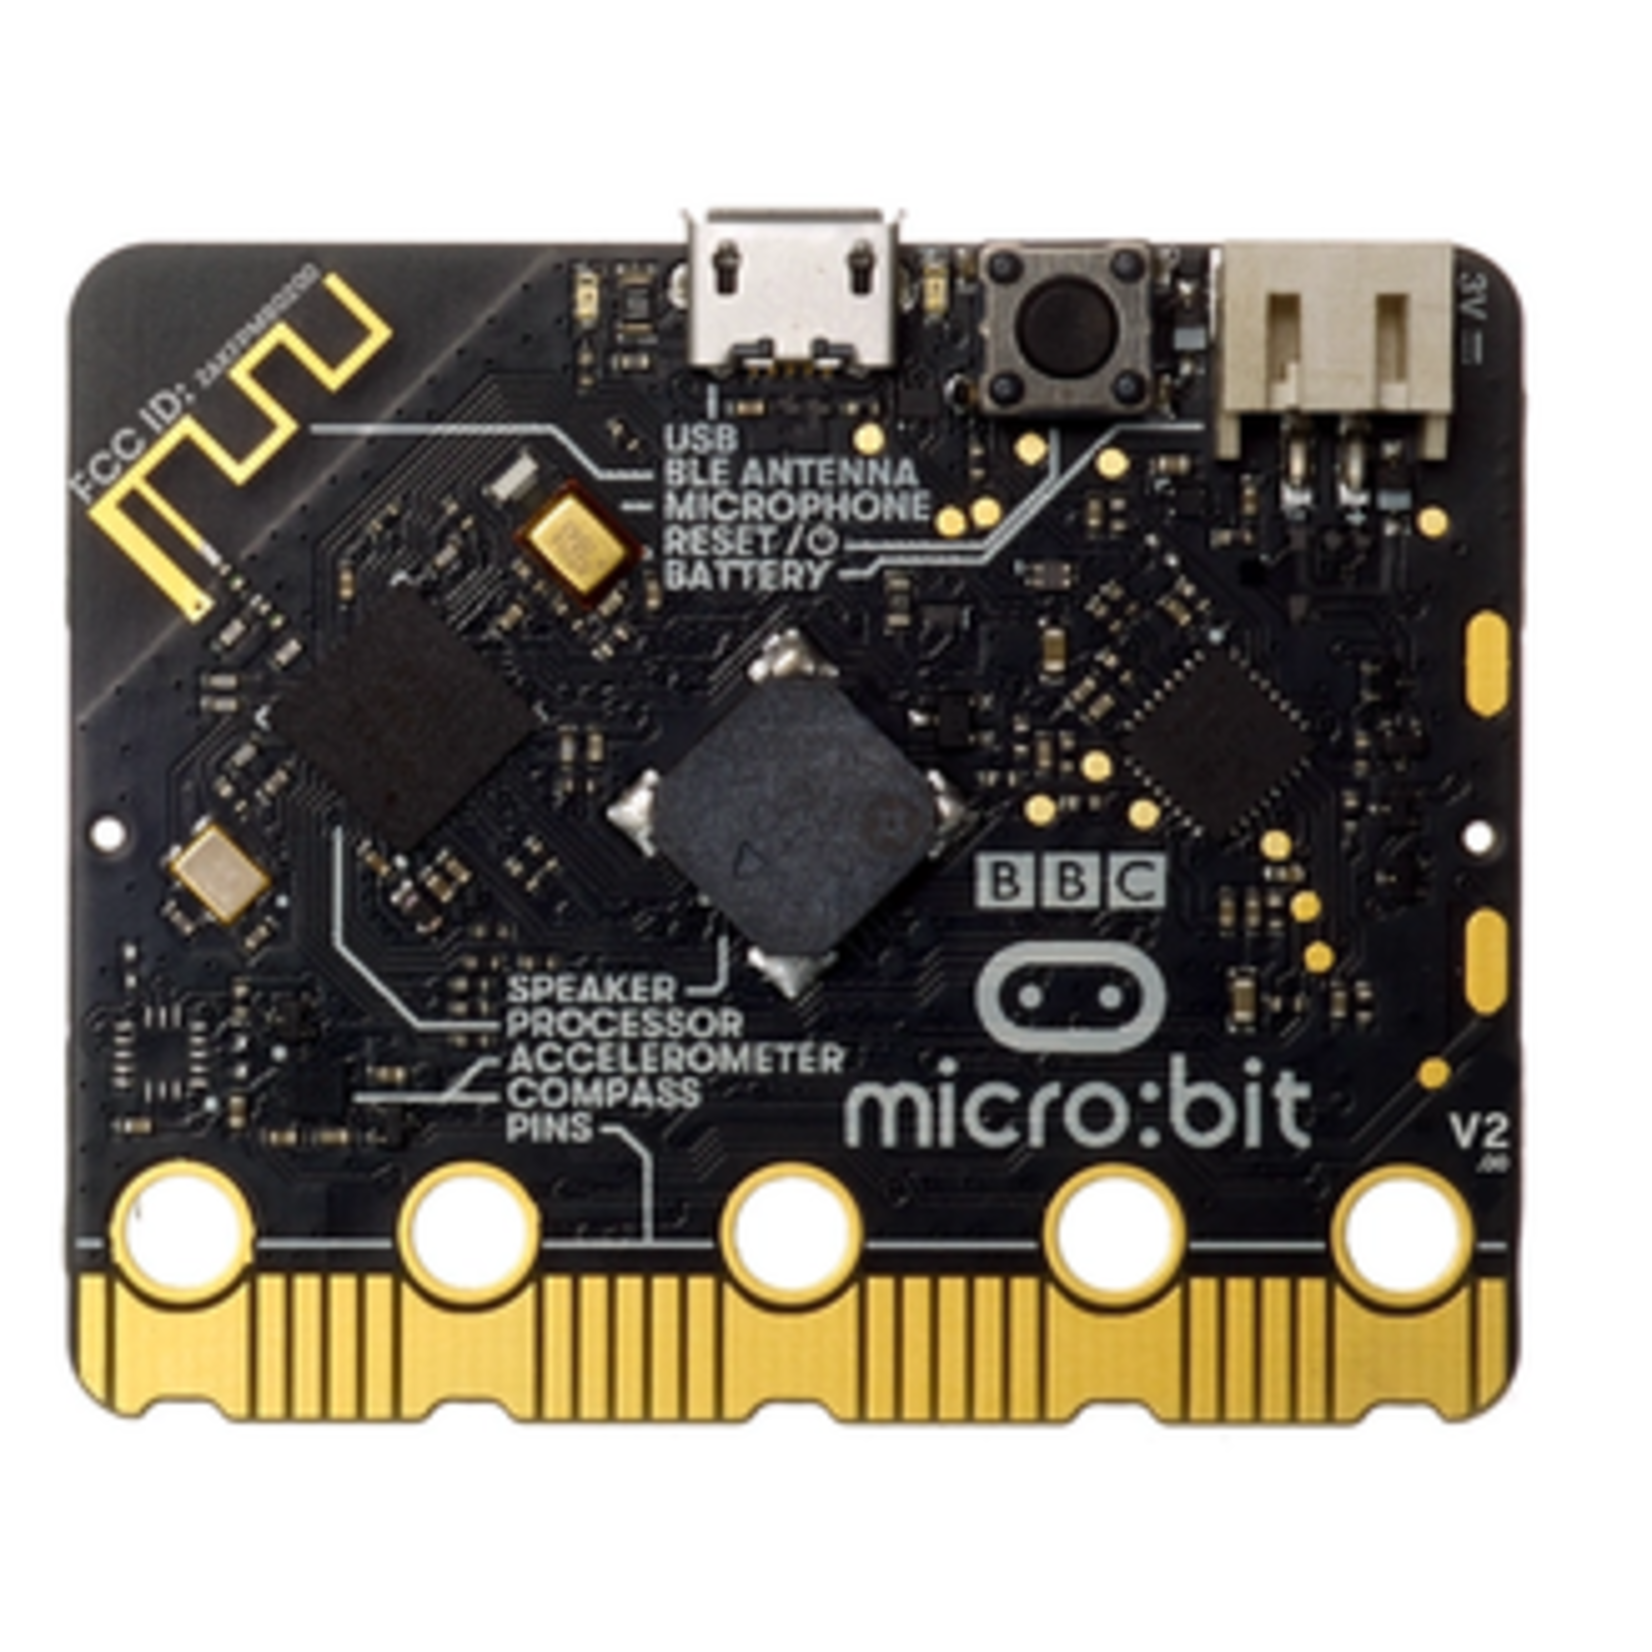 BBC micro:bit Micro:bit V2 Club 10 pack